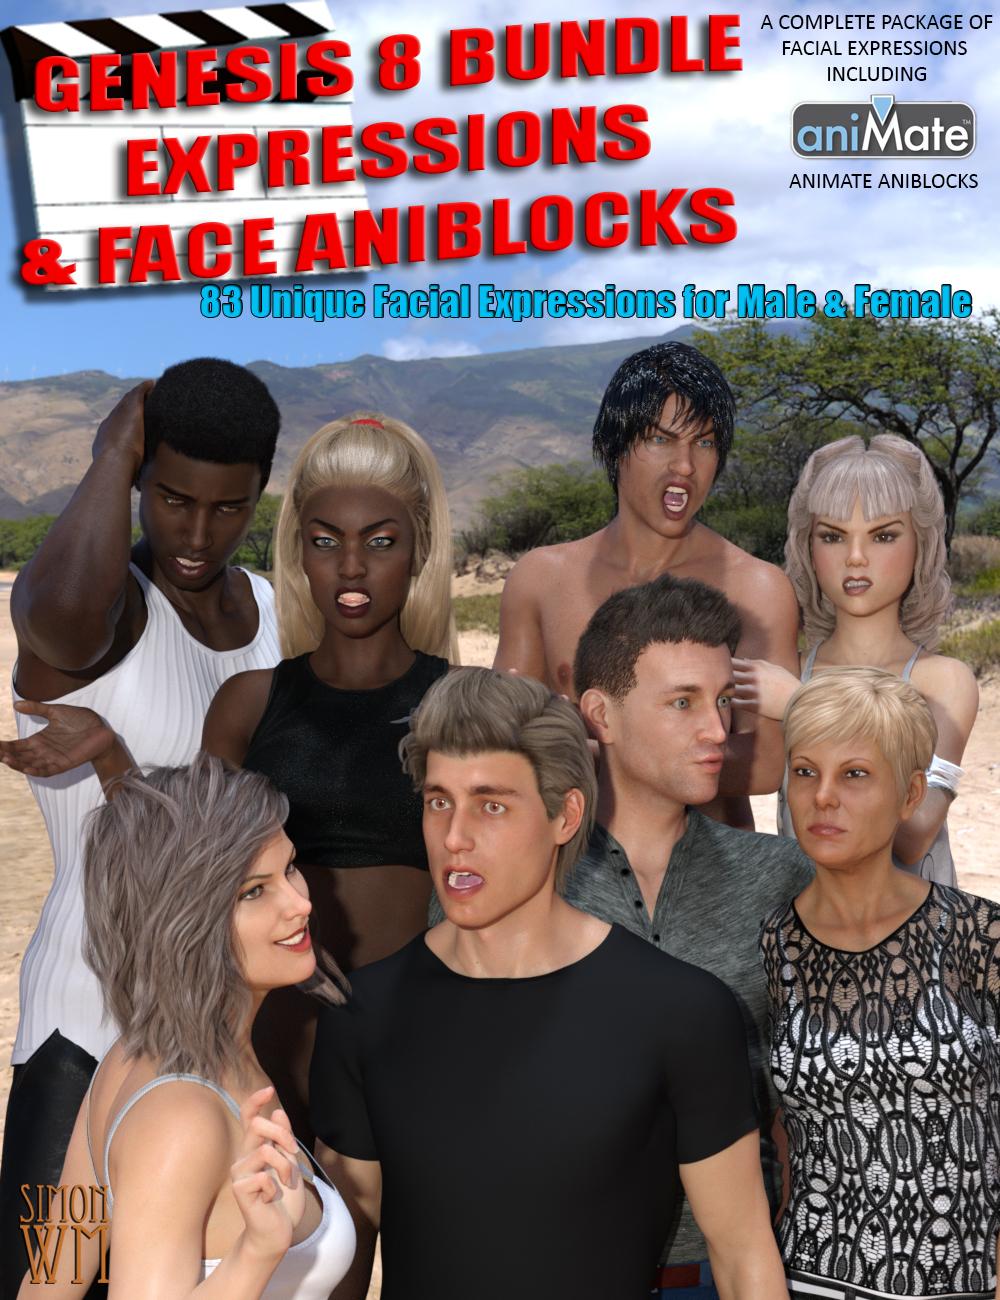 Genesis 8 Bundle Expressions & Face aniBlocks by: SimonWM, 3D Models by Daz 3D